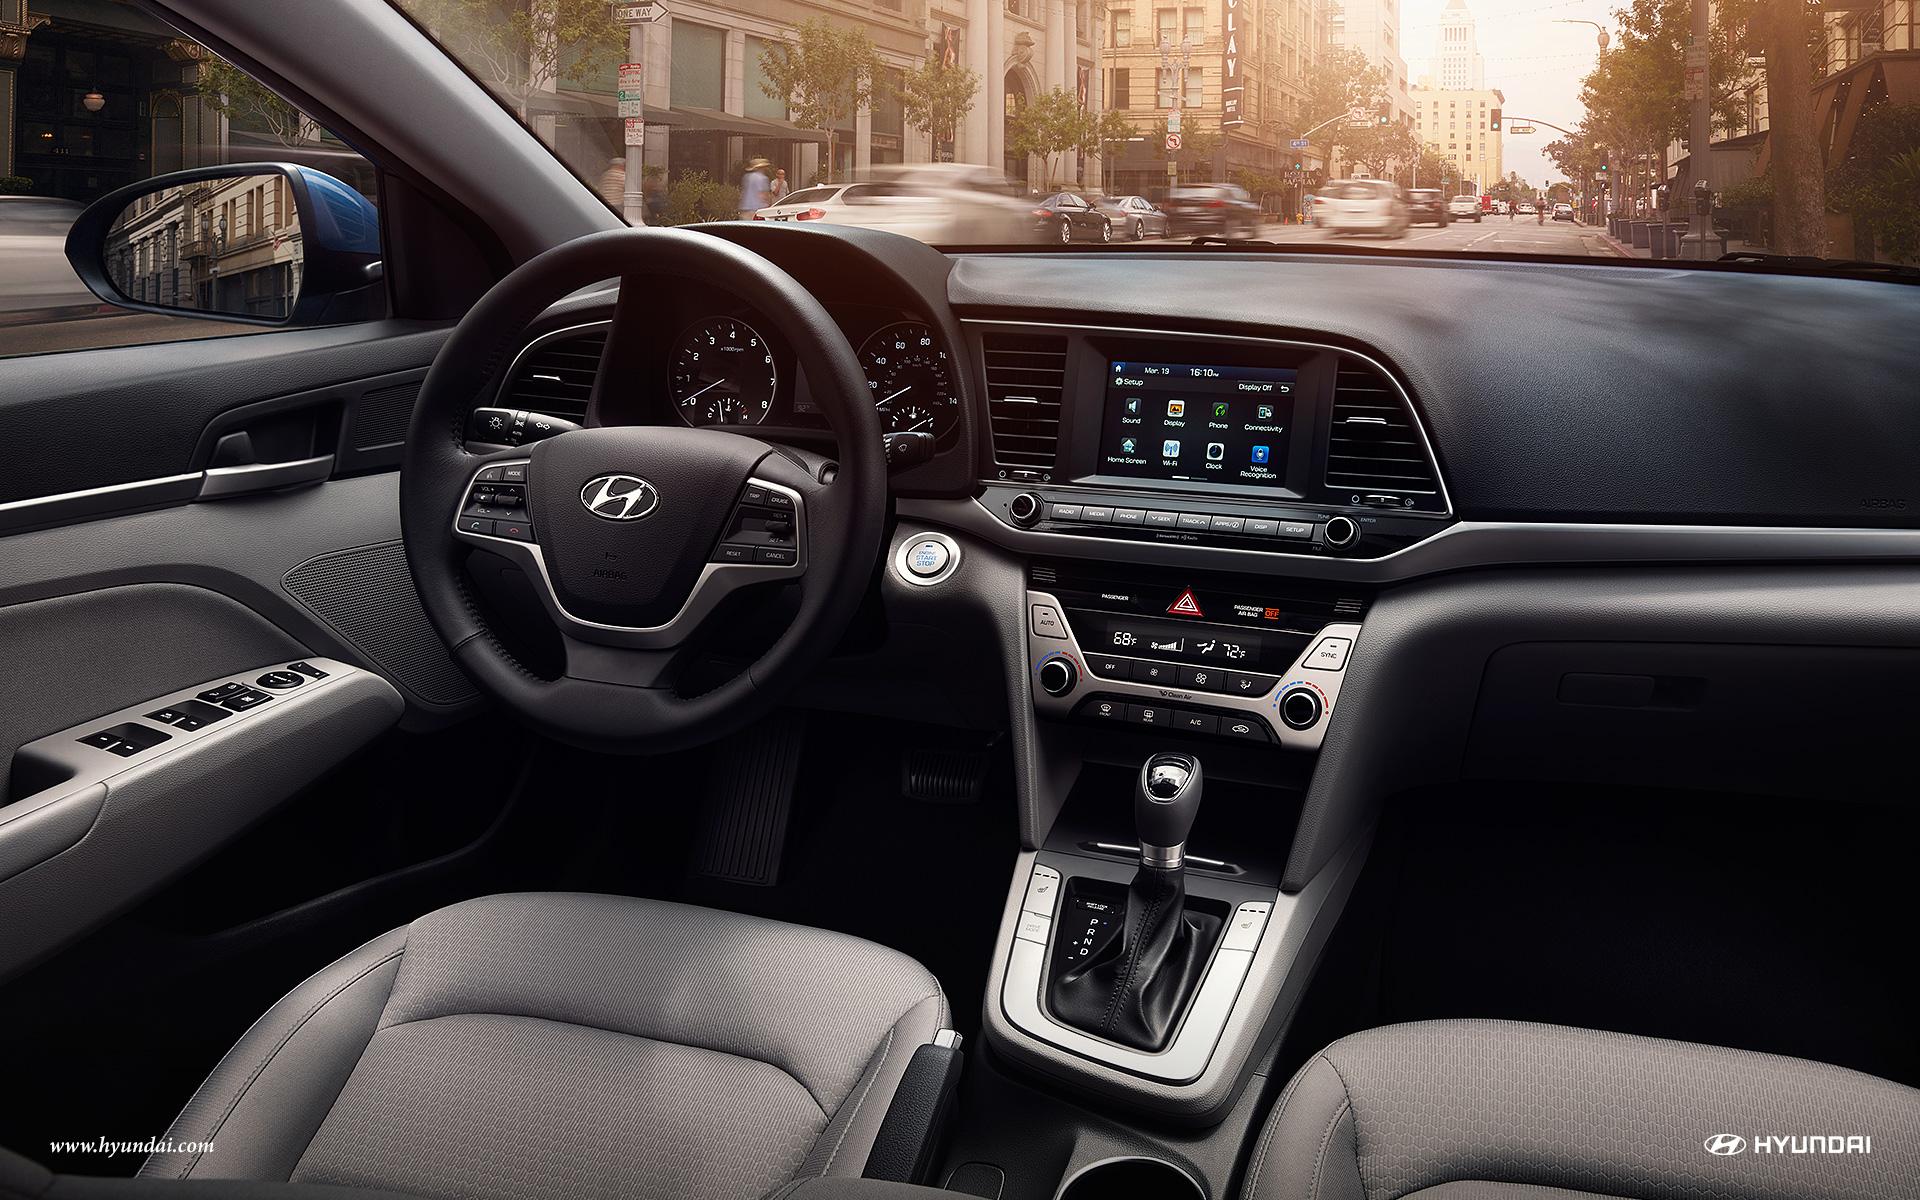 Review The 2017 Hyundai Elantra Signals A Bright Future For Hyundai Gafollowers